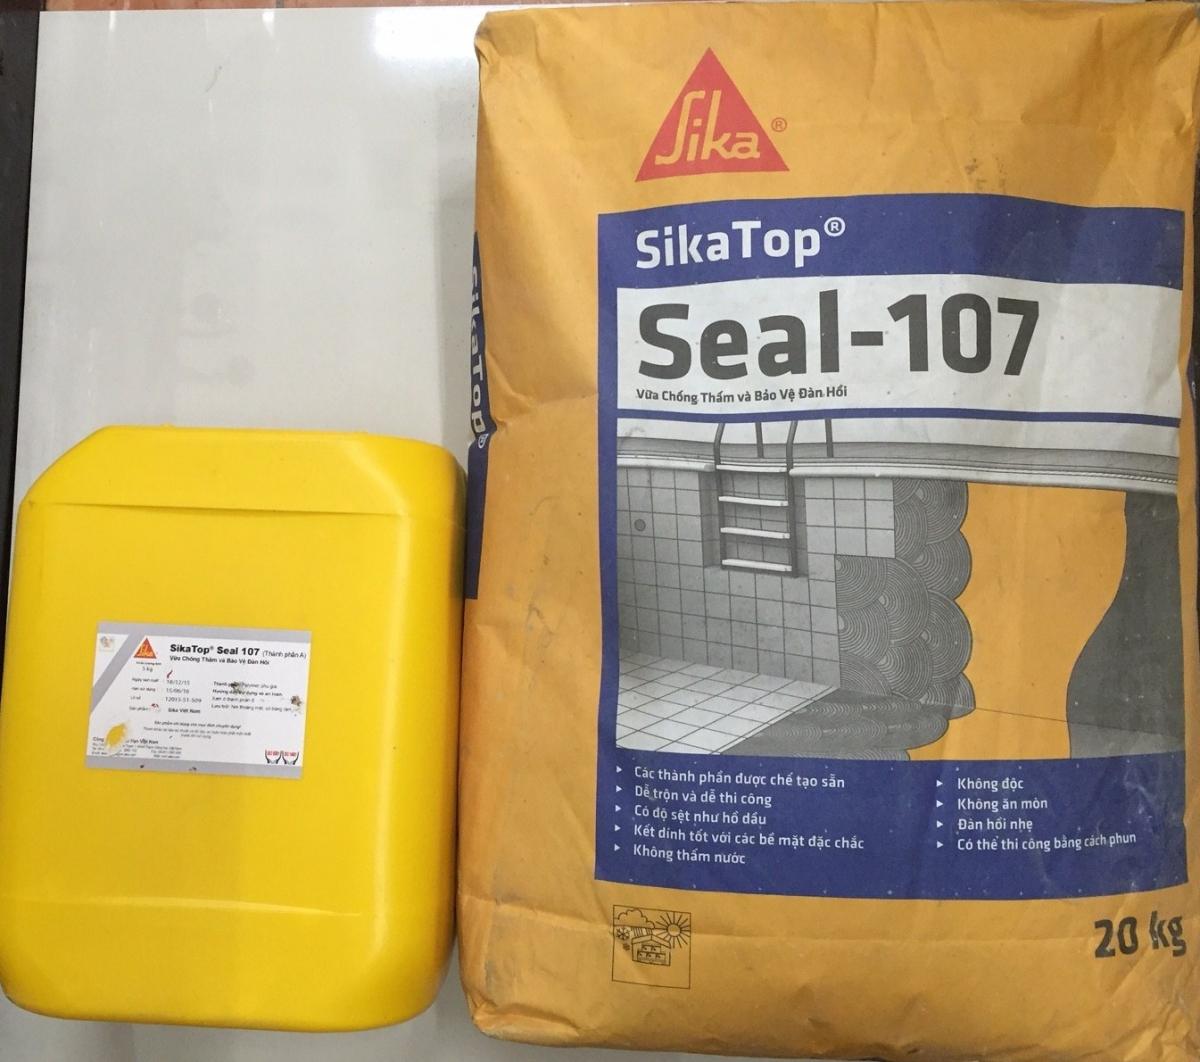 Bán SikaTop Seal 107 | ban SikaTop Seal 107 | chống thấm sika | chong tham sika | bán sika | ban sika | đại lý sika | dai ly sika | phân phối sika | phan phoi sika